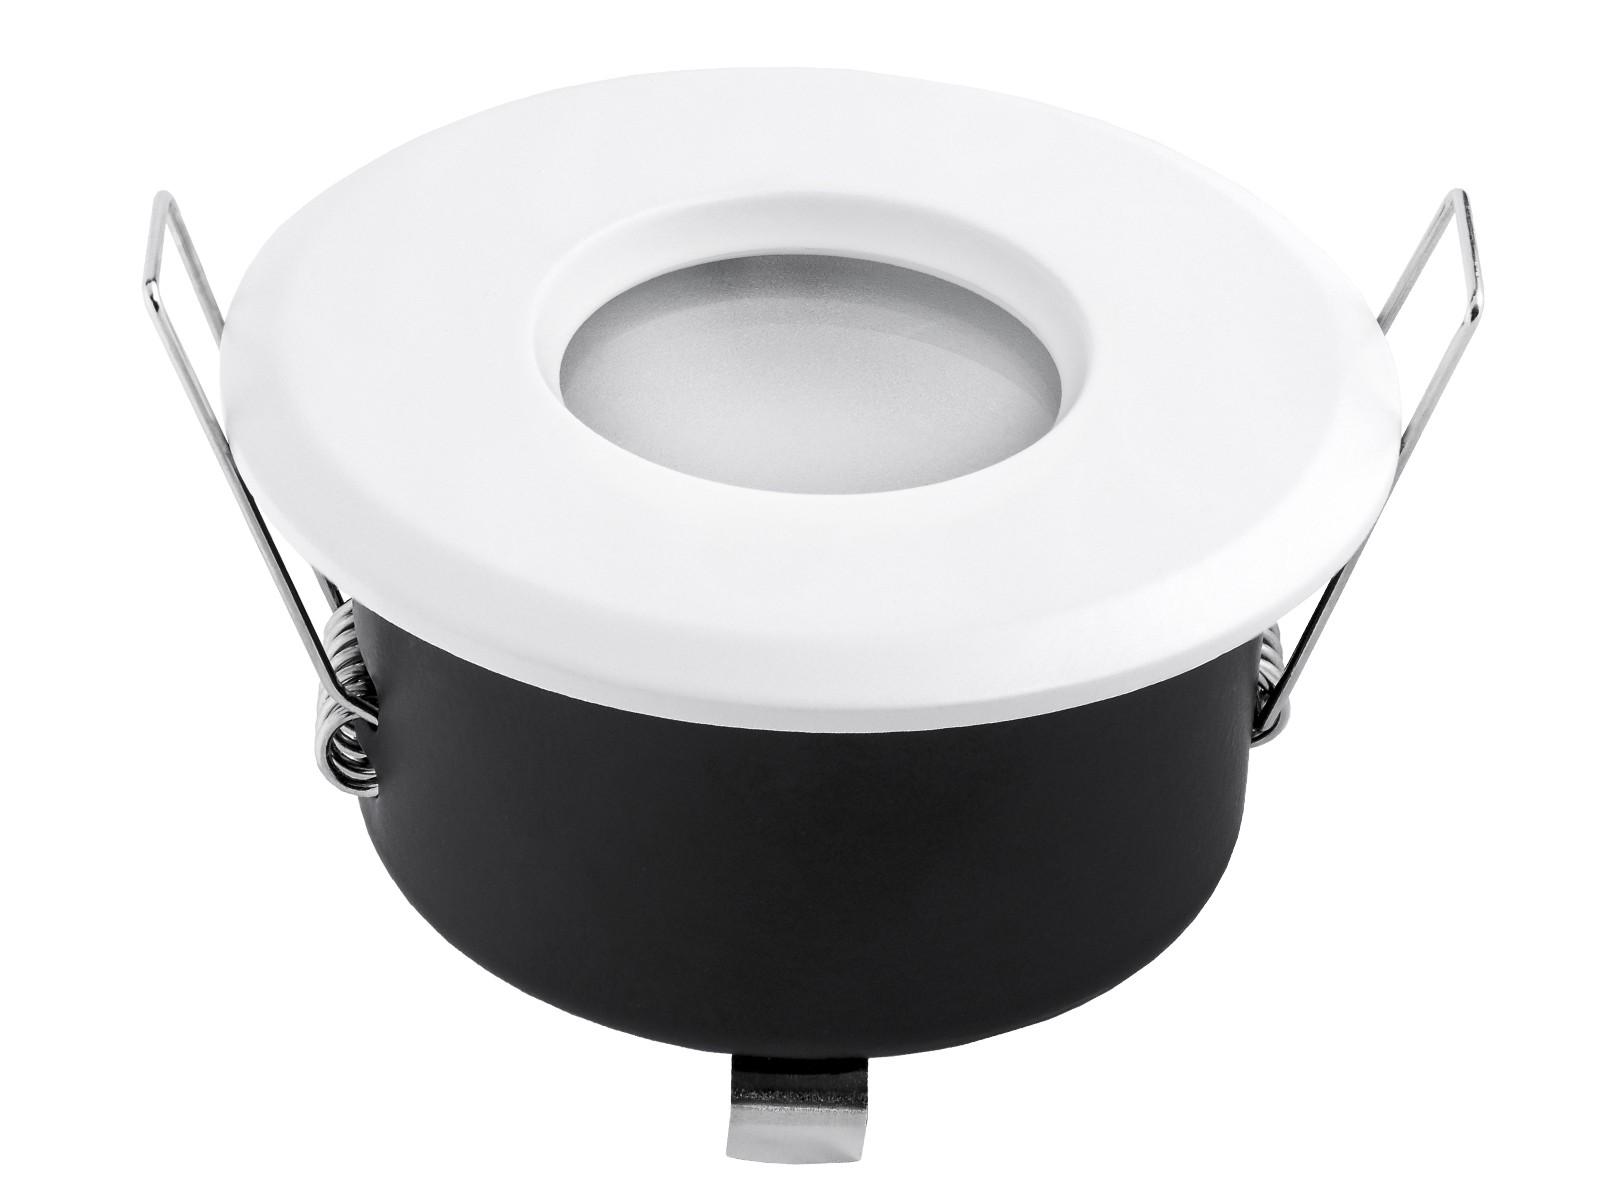 led einbaustrahler ip65 wei rund 230v f r bad k che oder au en warmwei 6w ebay. Black Bedroom Furniture Sets. Home Design Ideas